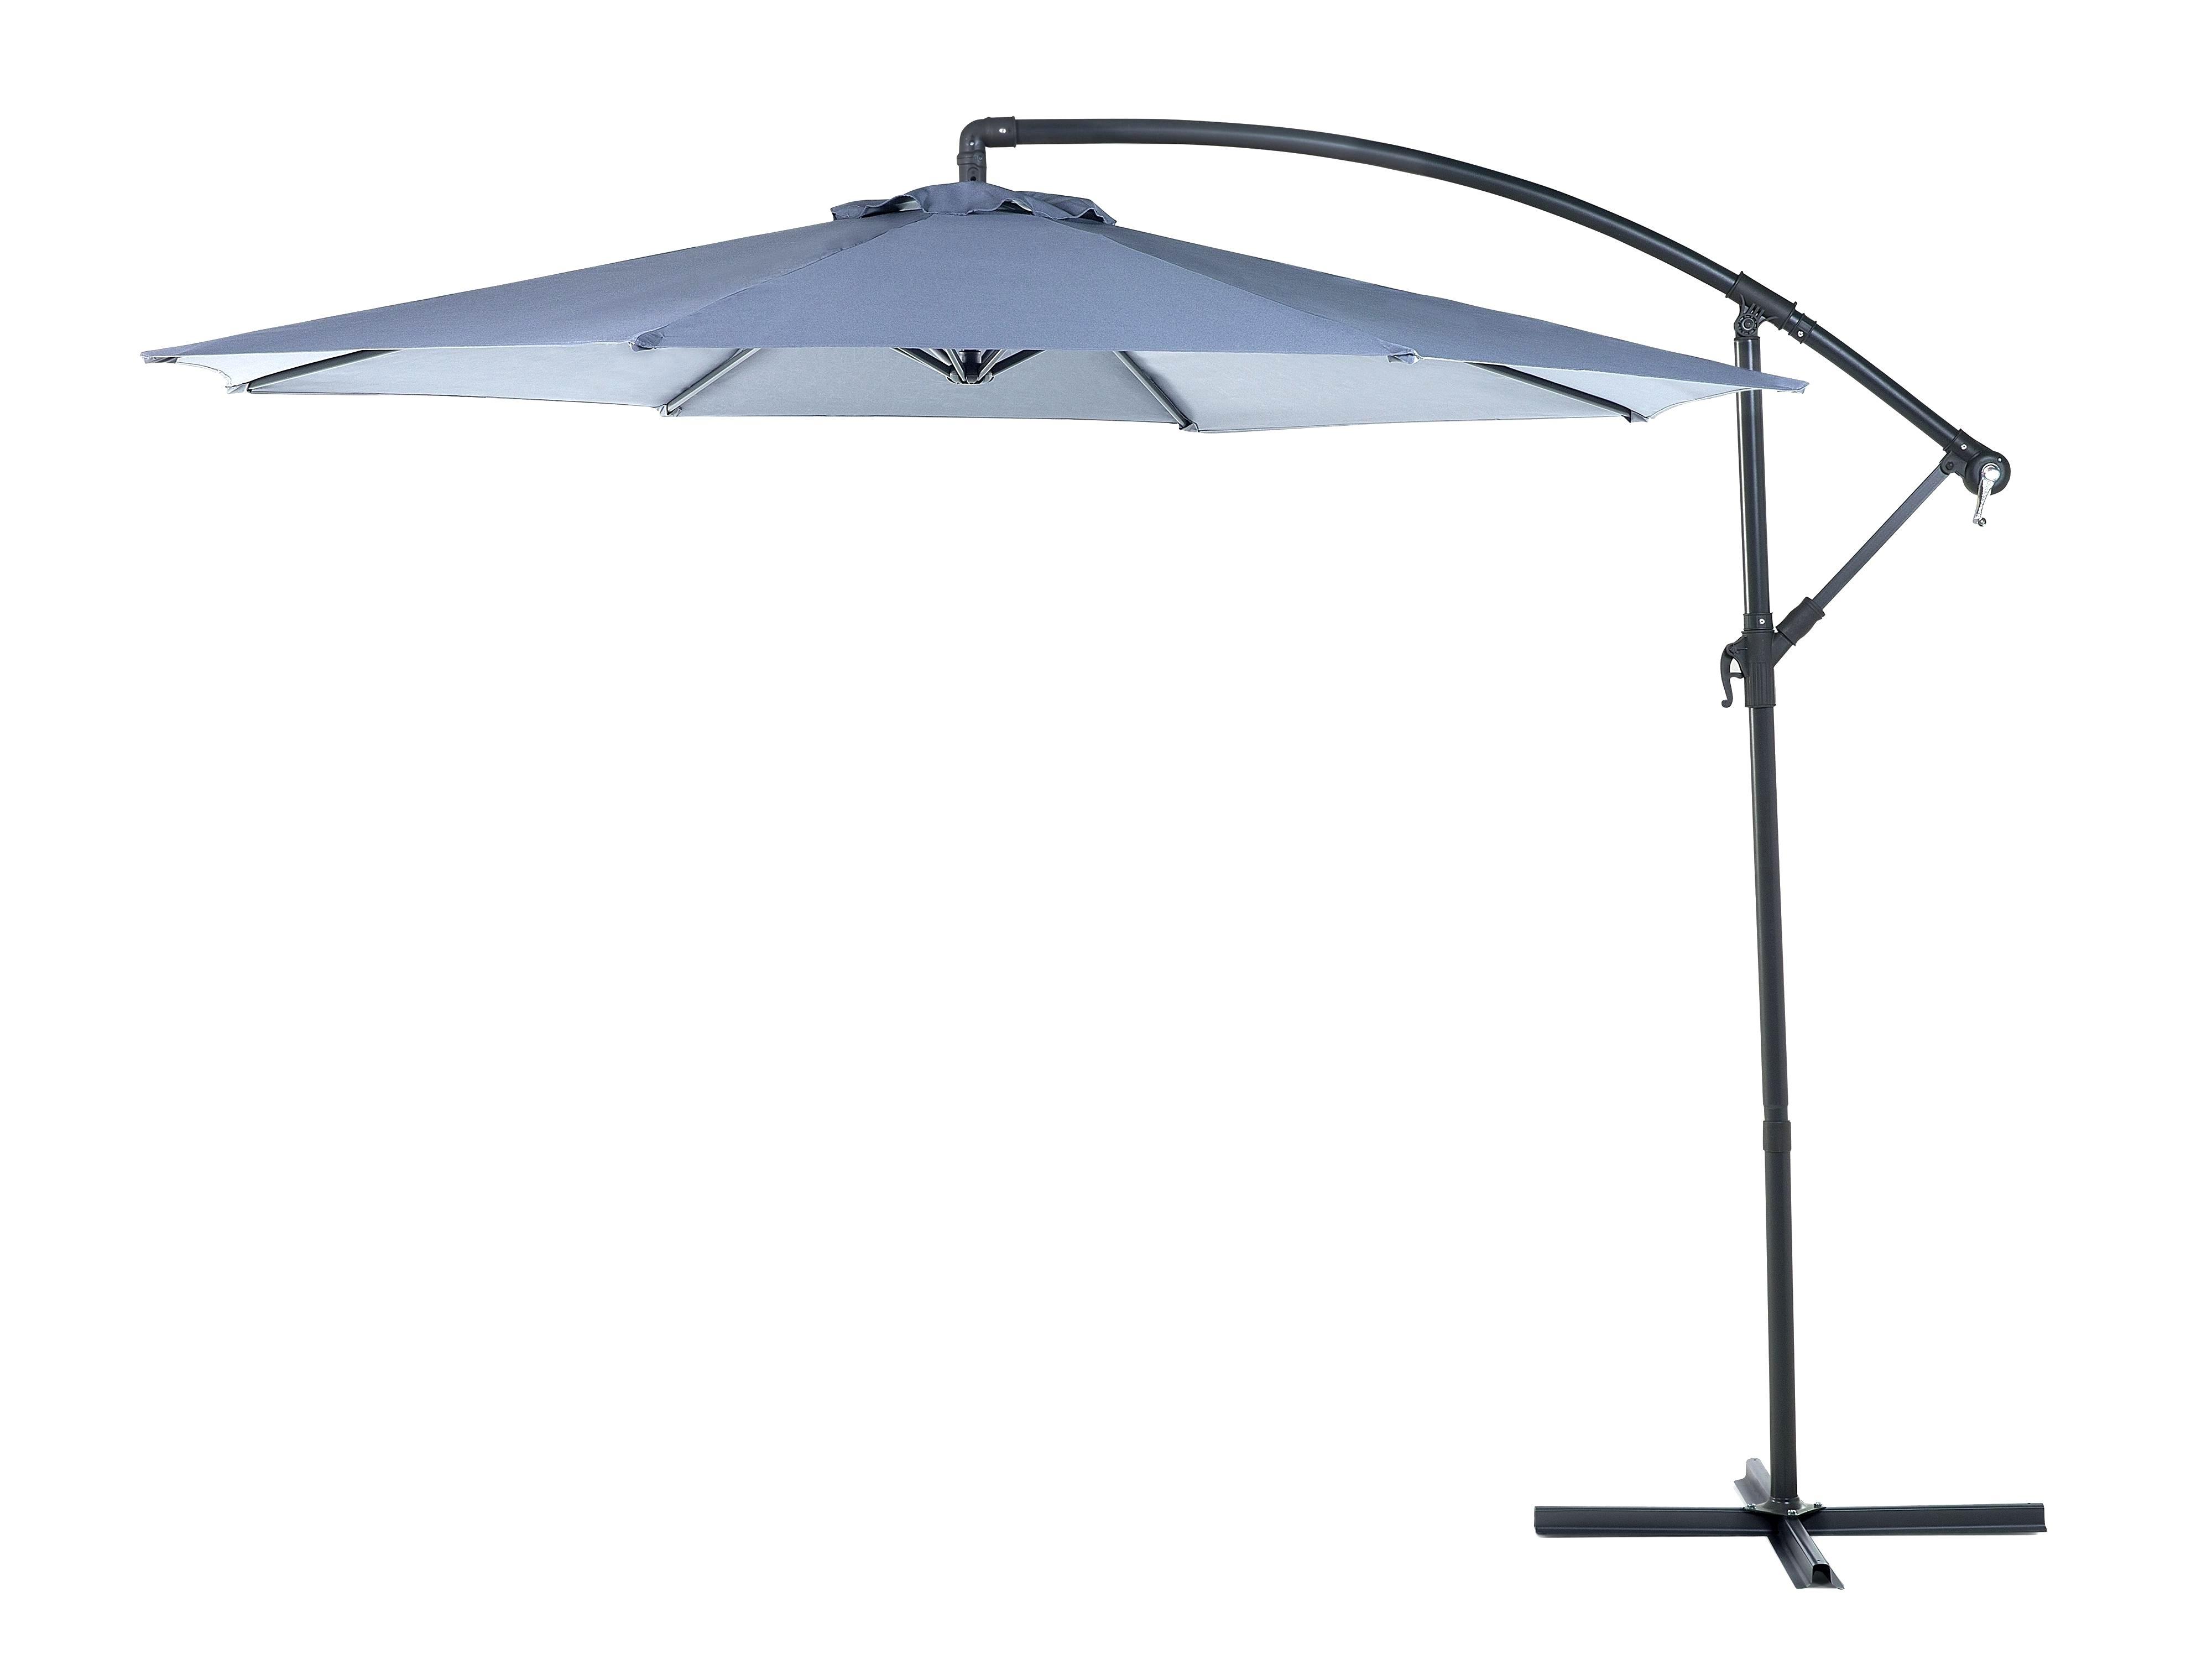 Recent Patio Umbrellas At Home Depot Regarding Patio Umbrella Lights Home Depot Awesome Beautiful Outdoor Umbrellas (View 20 of 20)